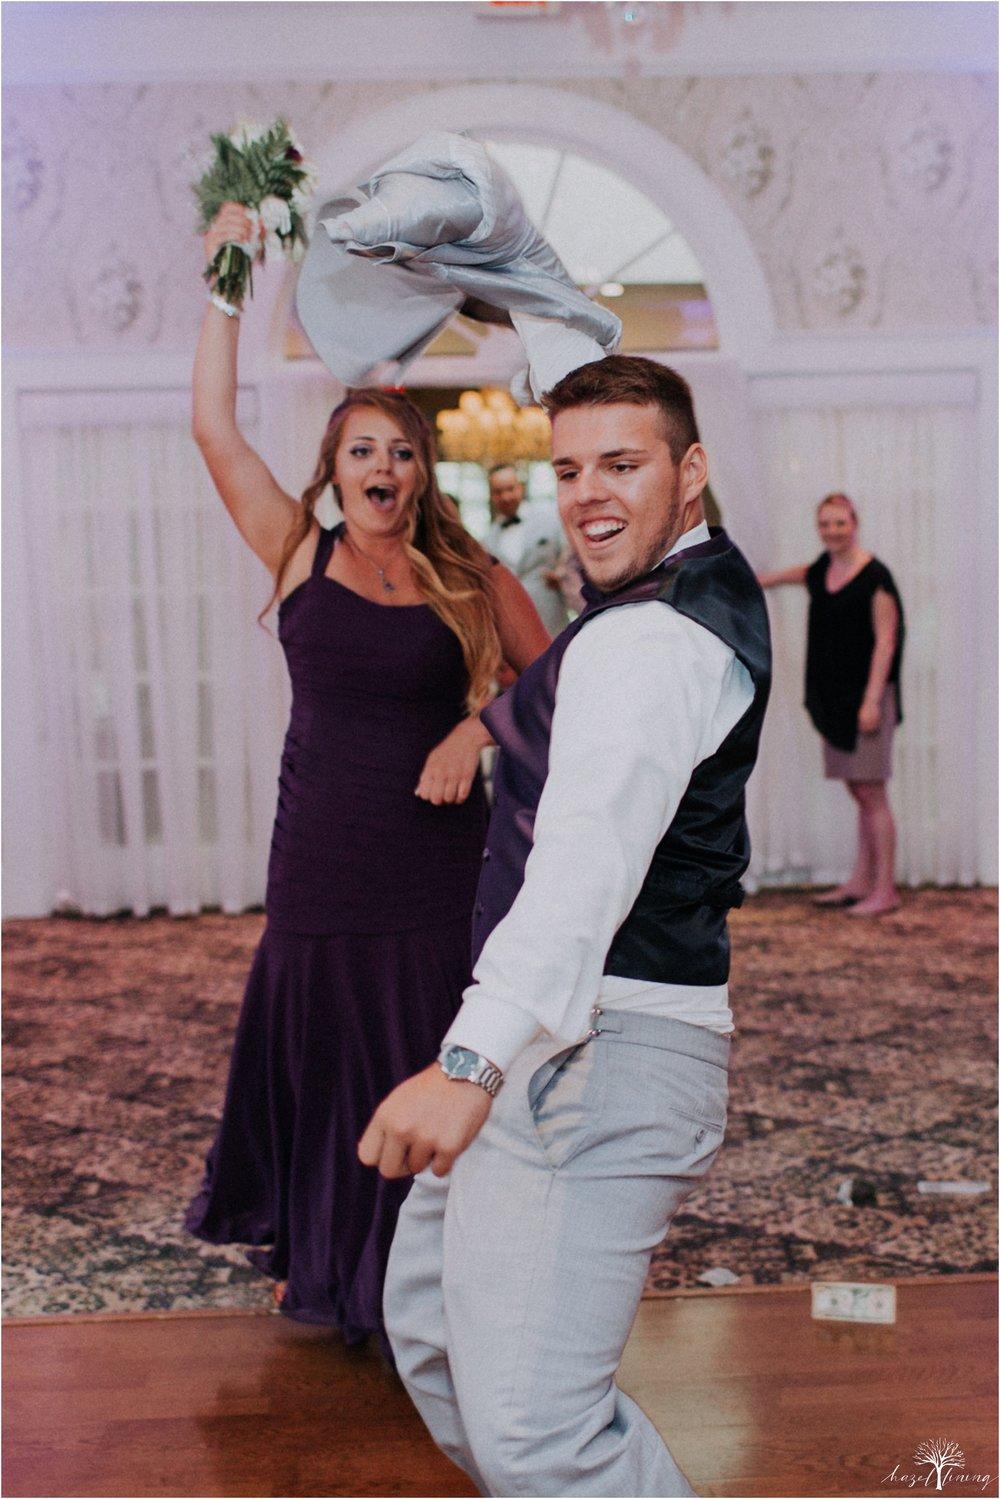 cassie-depinto-tyler-bodder-playwicki-farm-buck-hotel-featserville-trevose-pennsylvania-summer-outdoor-wedding-hazel-lining-travel-wedding-elopement-photography_0277.jpg